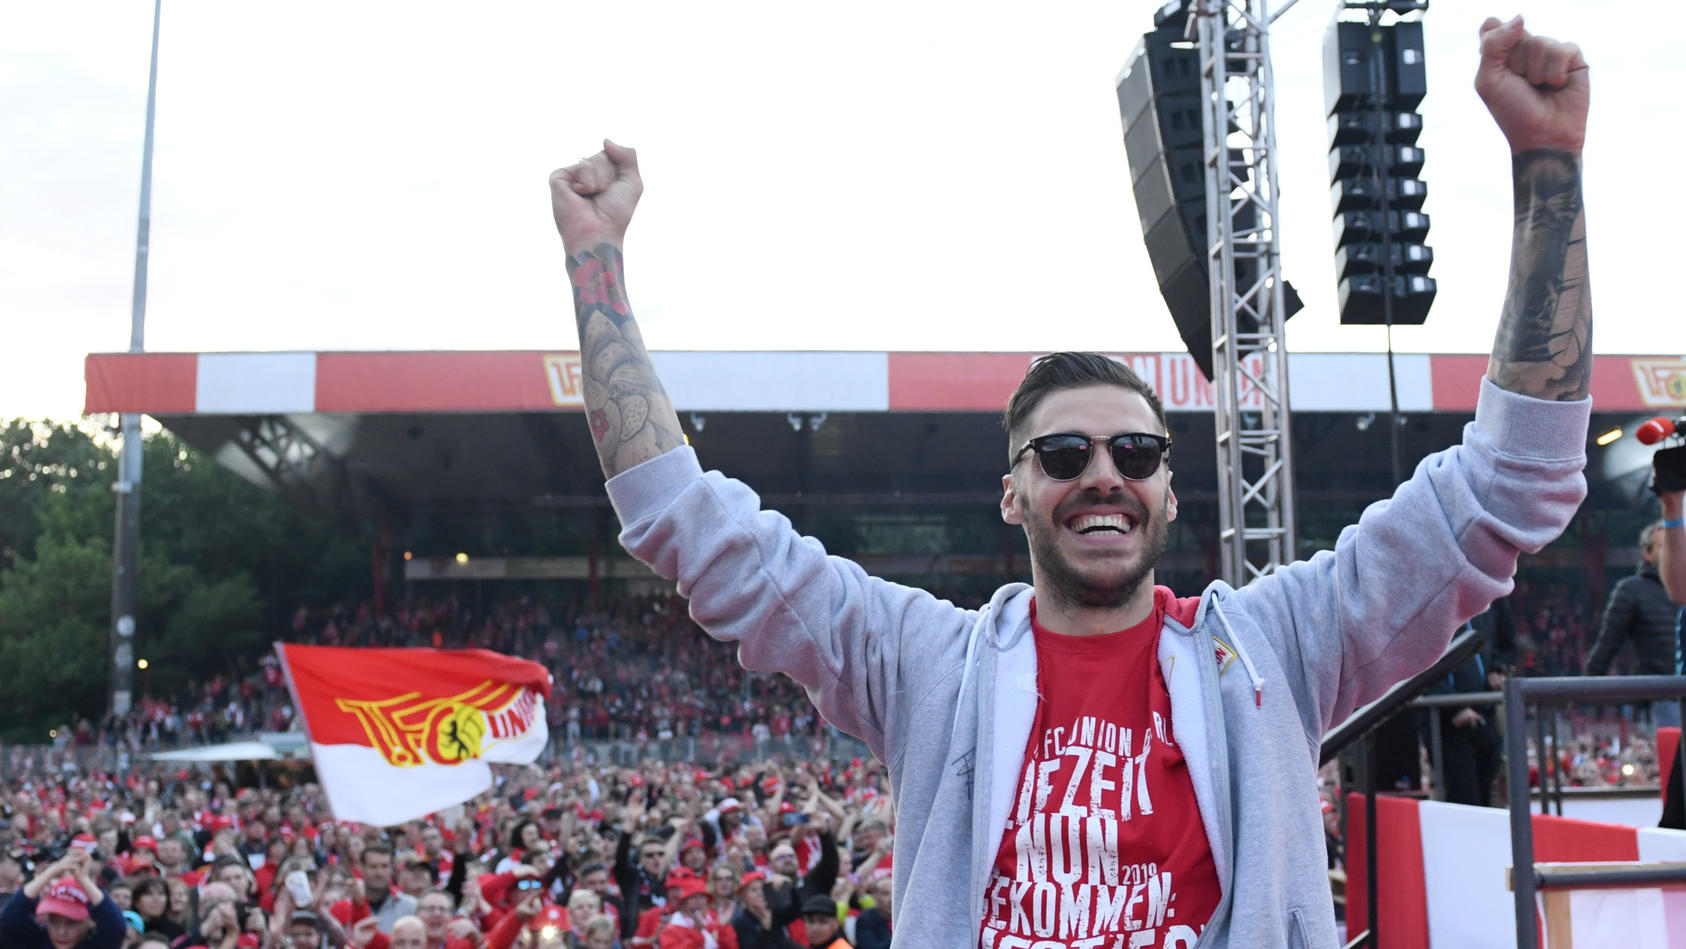 Union Berlin Celebrate Promotion To Bundesliga